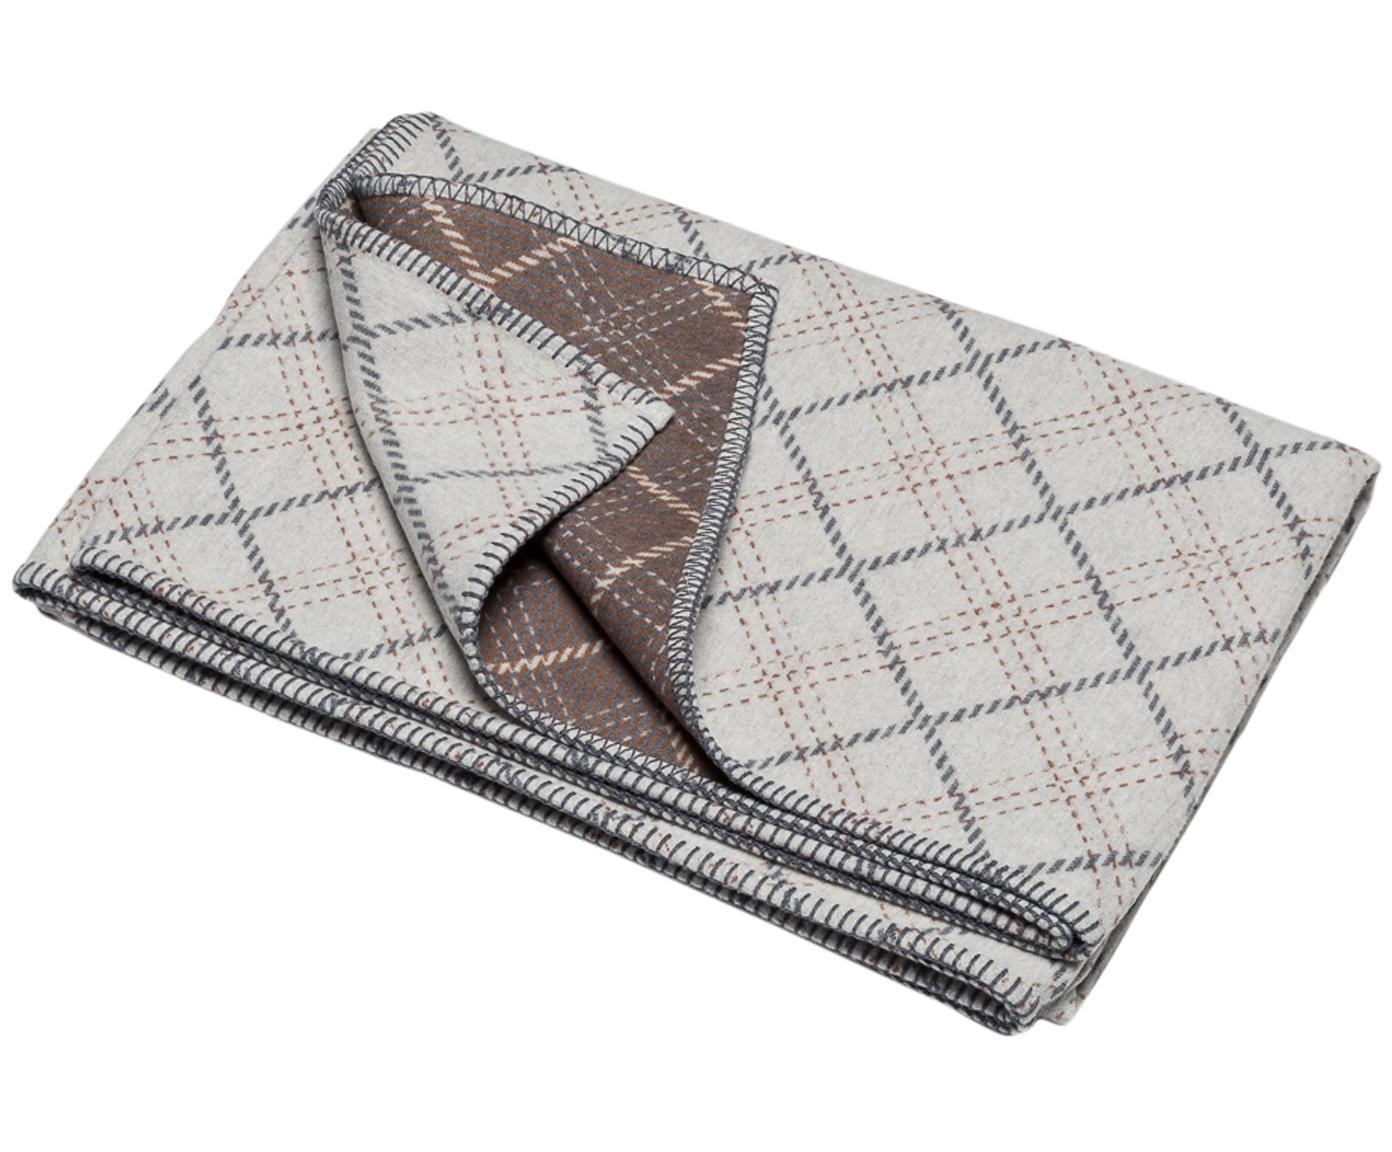 Manta Karol, Tapizado: 85%algodón, 8%viscosa, , Gris claro, gris, beige, An 140 x L 200 cm